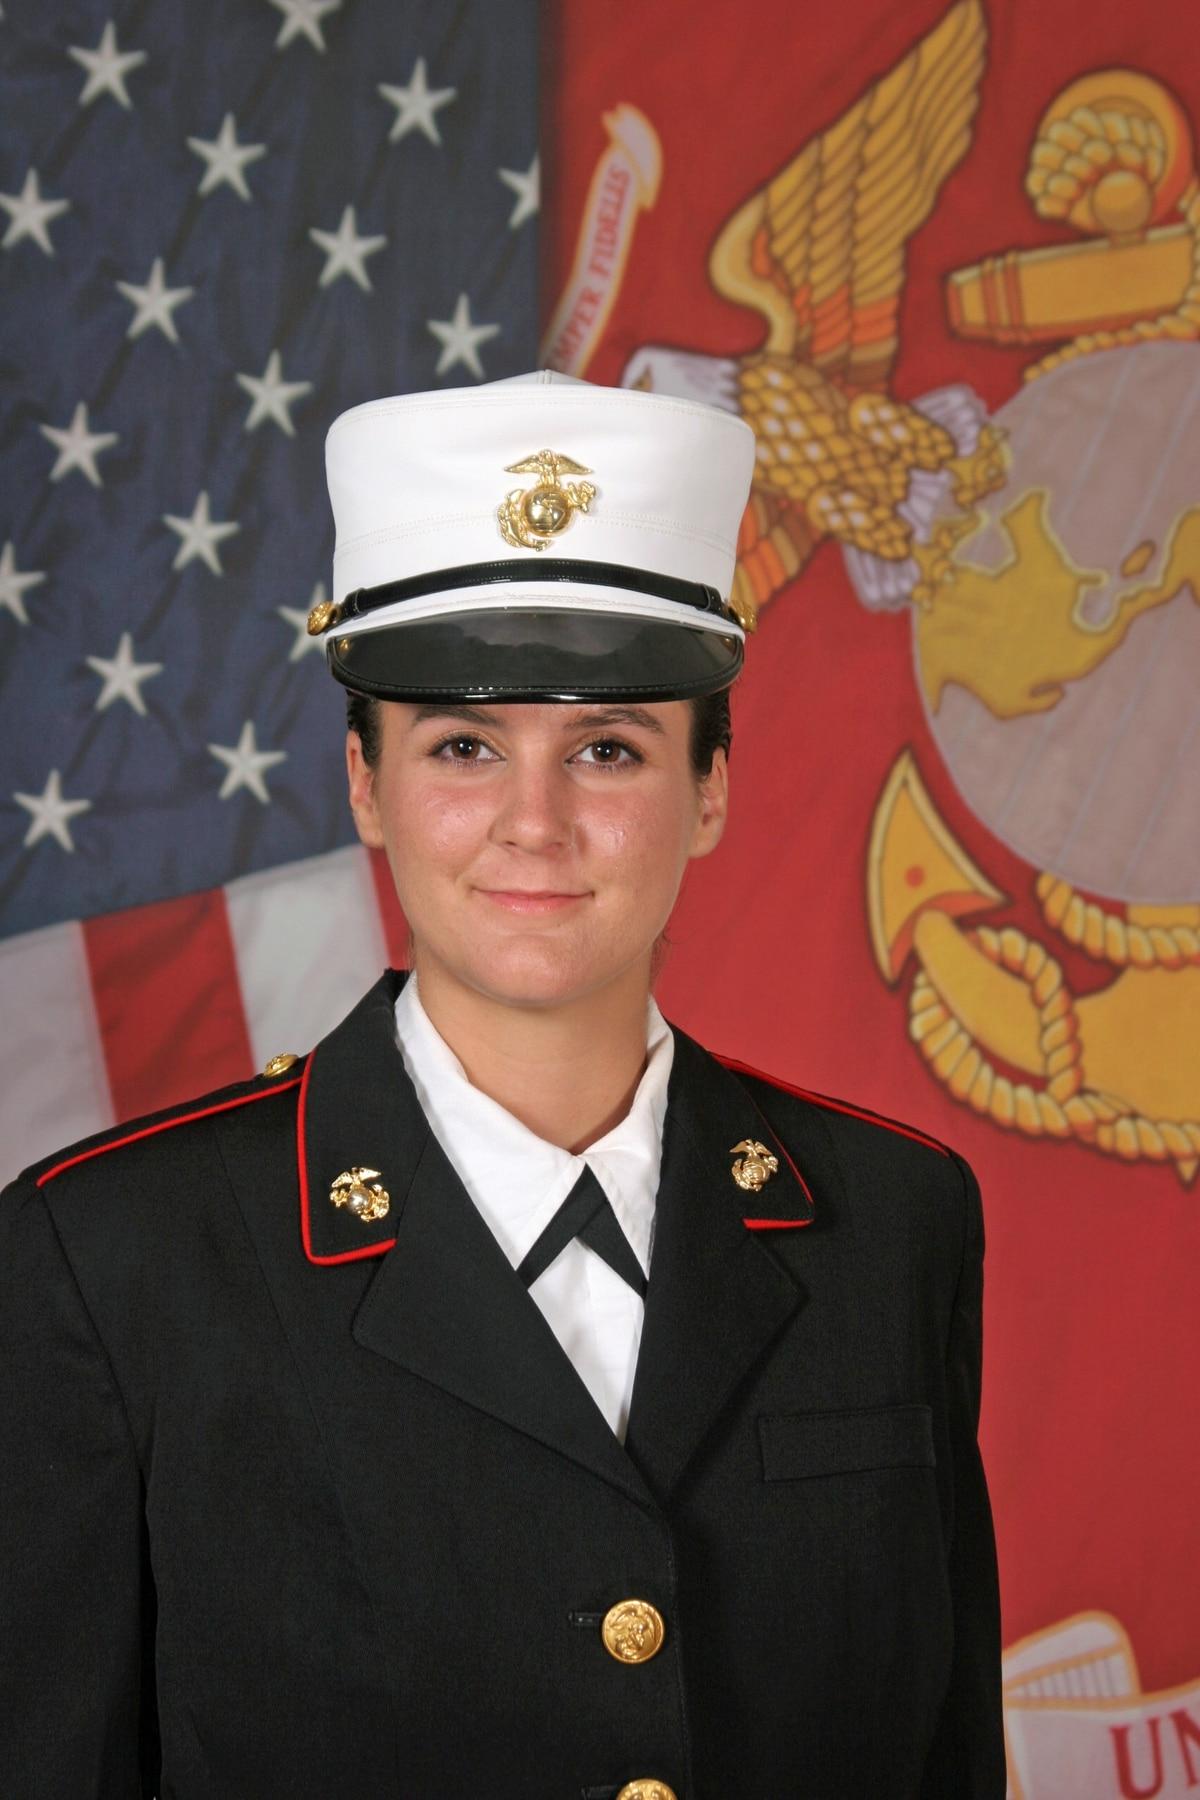 marine corps 17 75k to honor marine vet  police officer